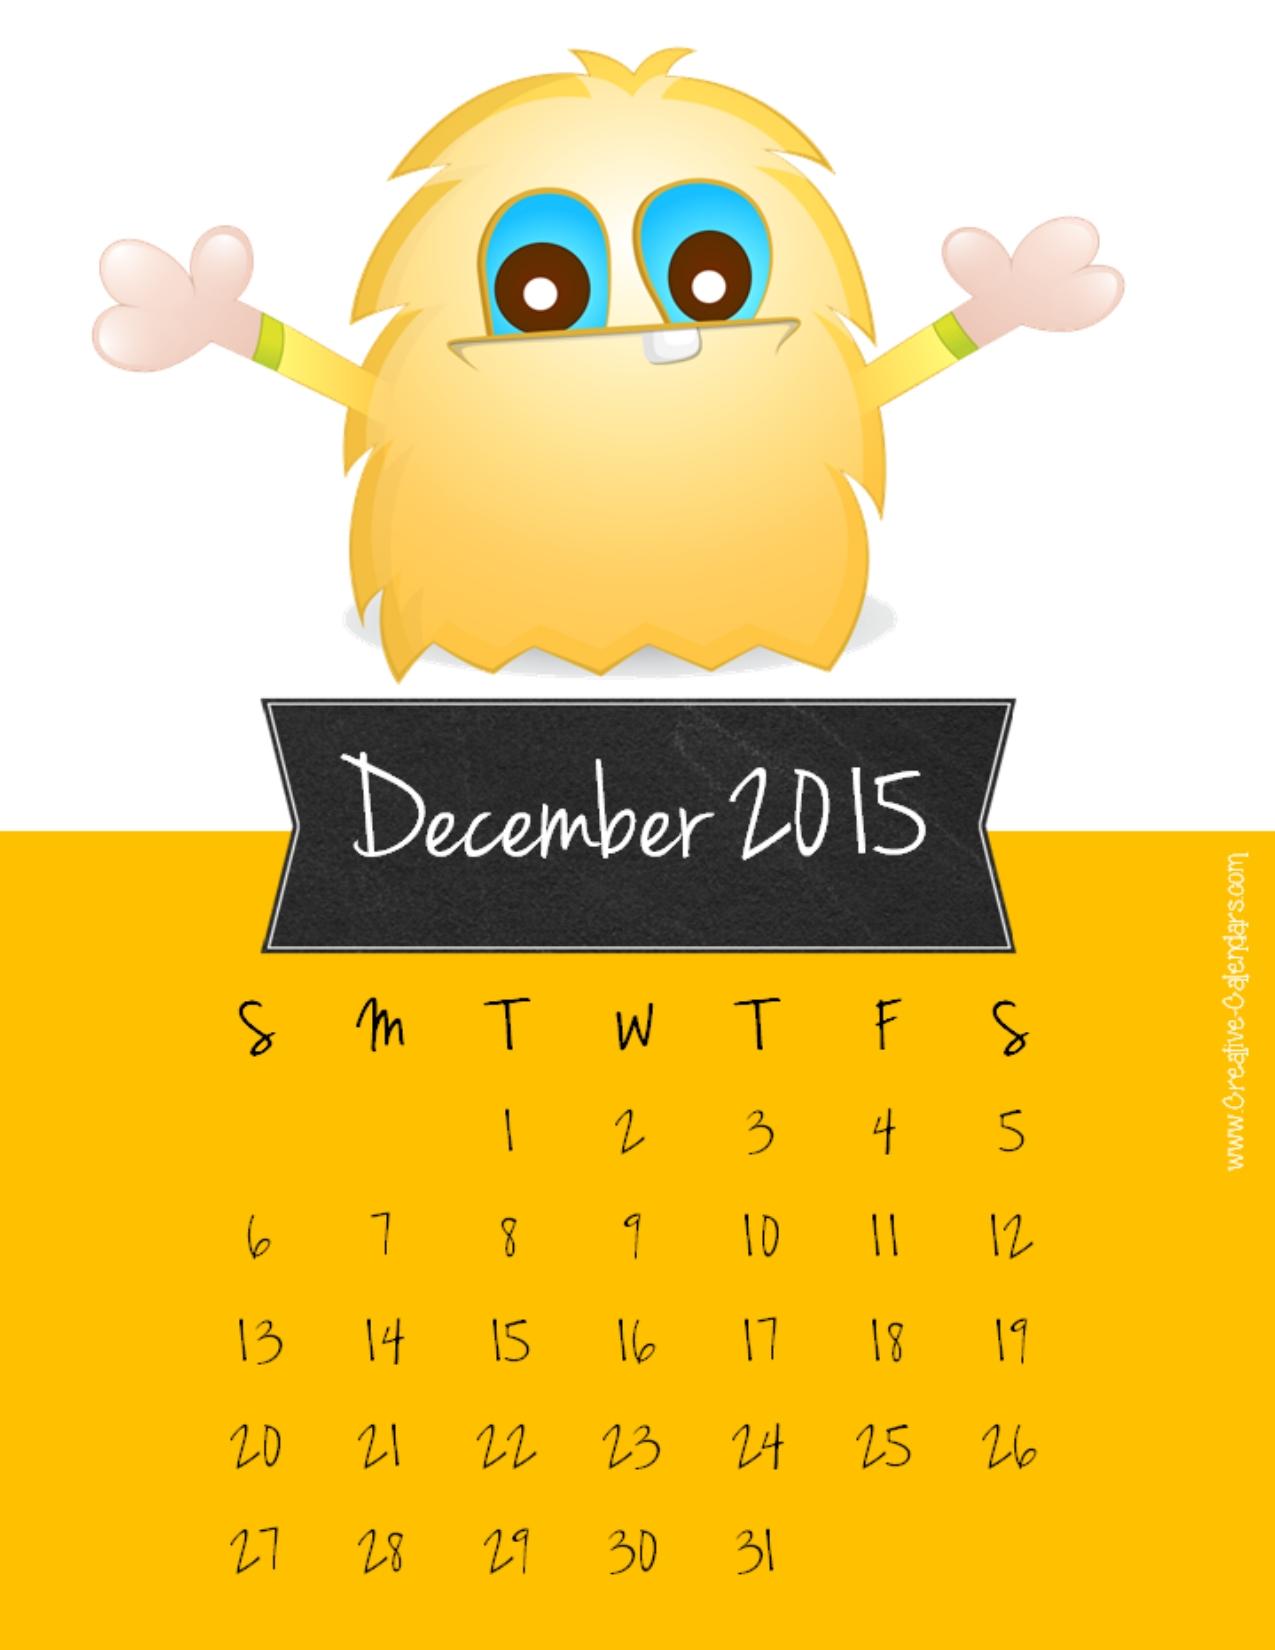 Christmas 2015 Calander Countdown Printable | Calendar Template 2016